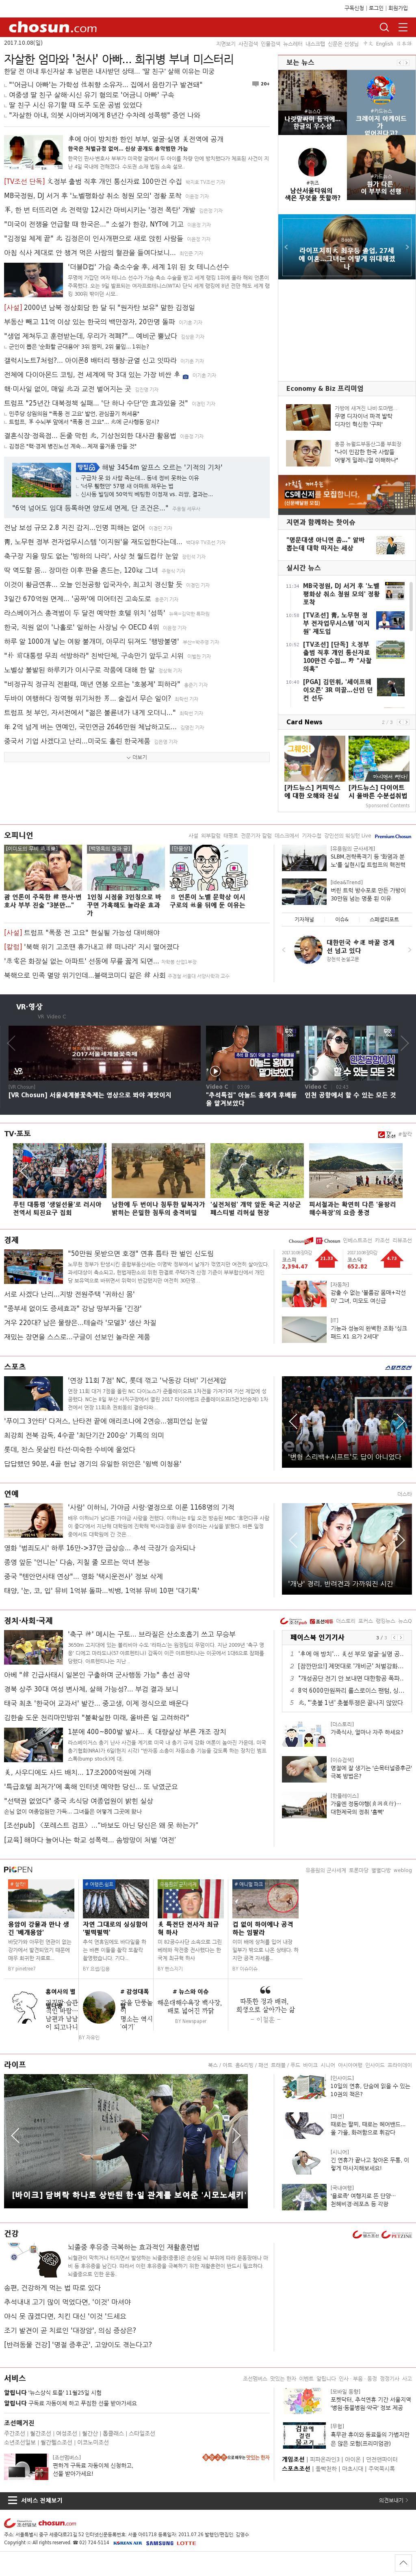 chosun.com at Sunday Oct. 8, 2017, 12:01 p.m. UTC